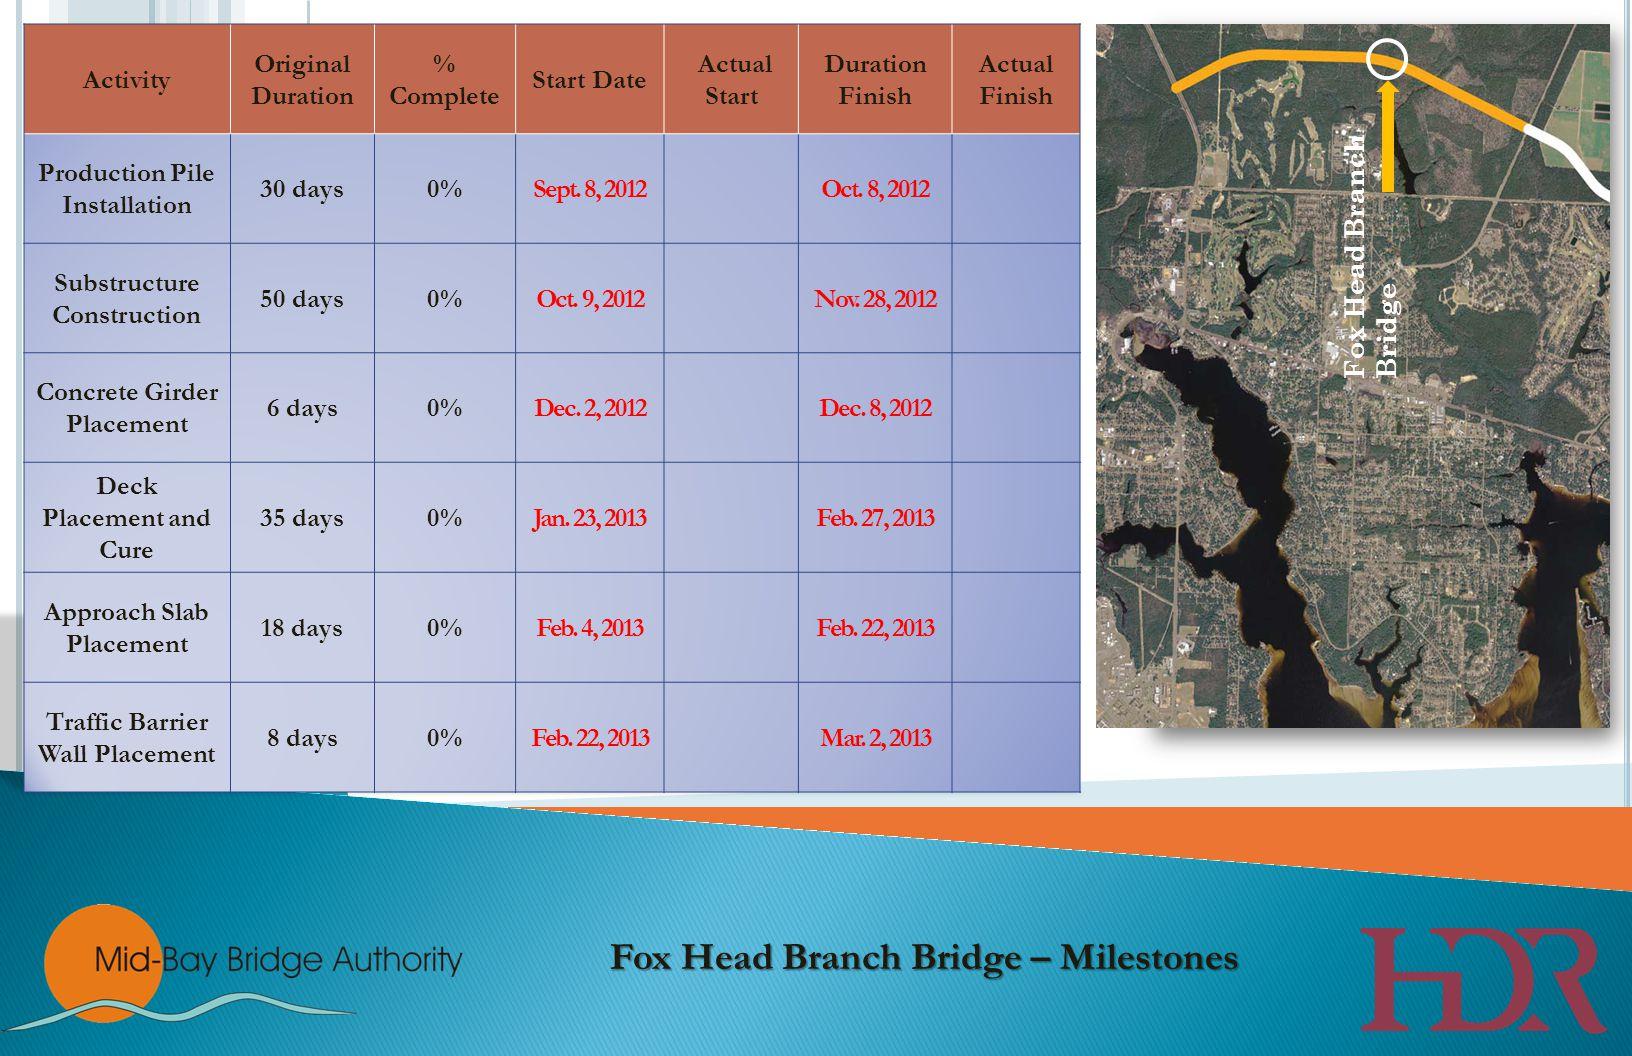 Range Road Bridge Fox Head Branch Bridge – Milestones Fox Head Branch Bridge